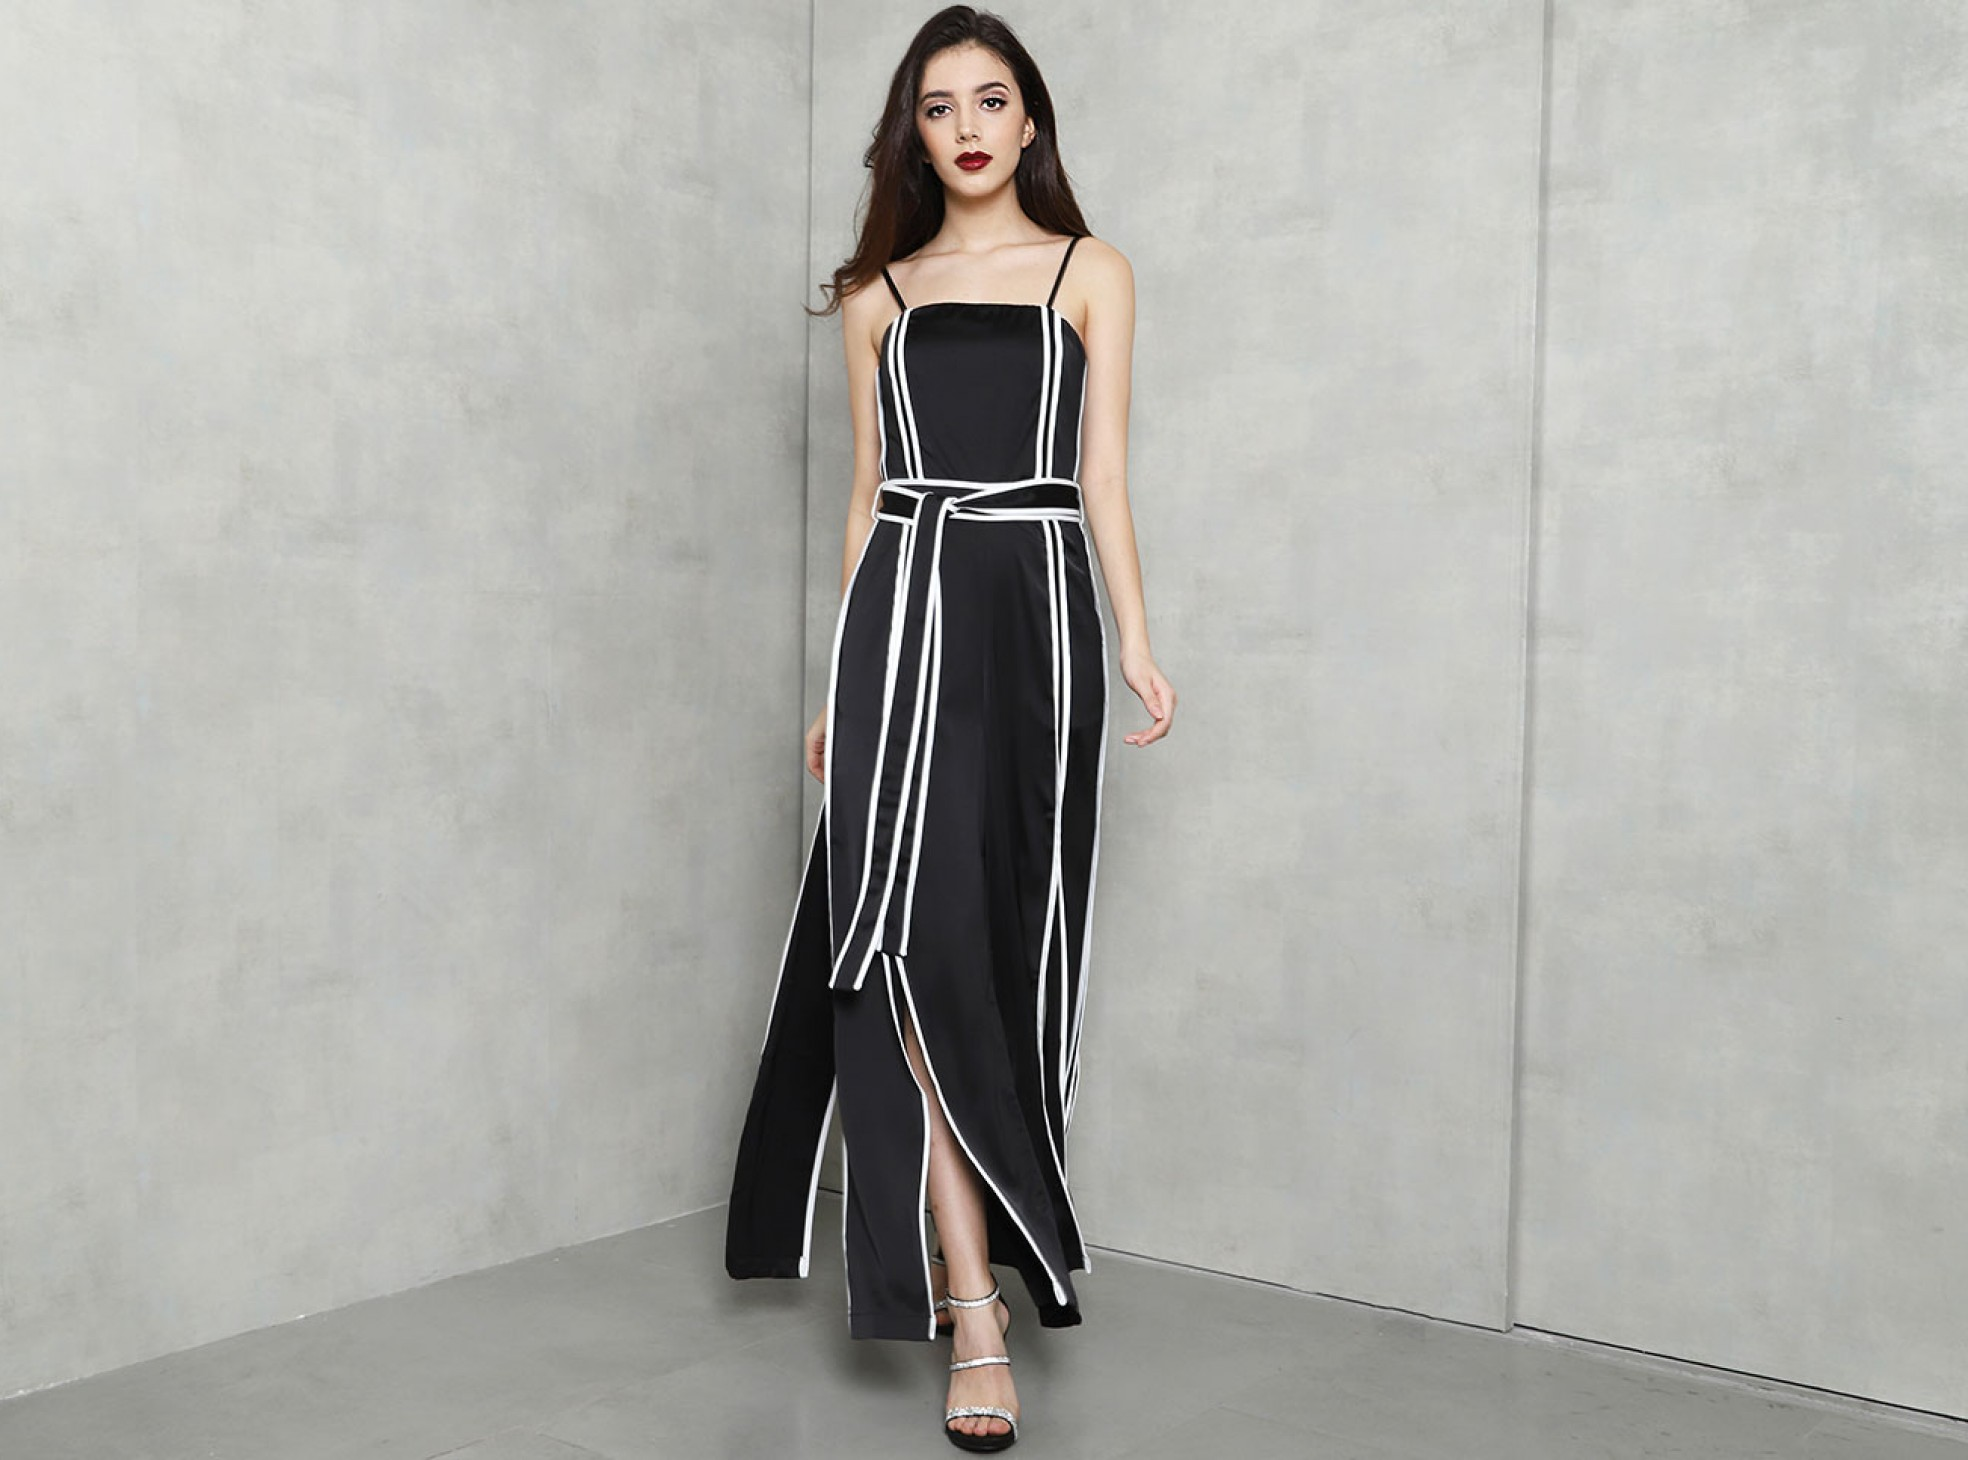 HELD HIGH JUMPSUIT BLACK   MAISION.COM : Fashion Online